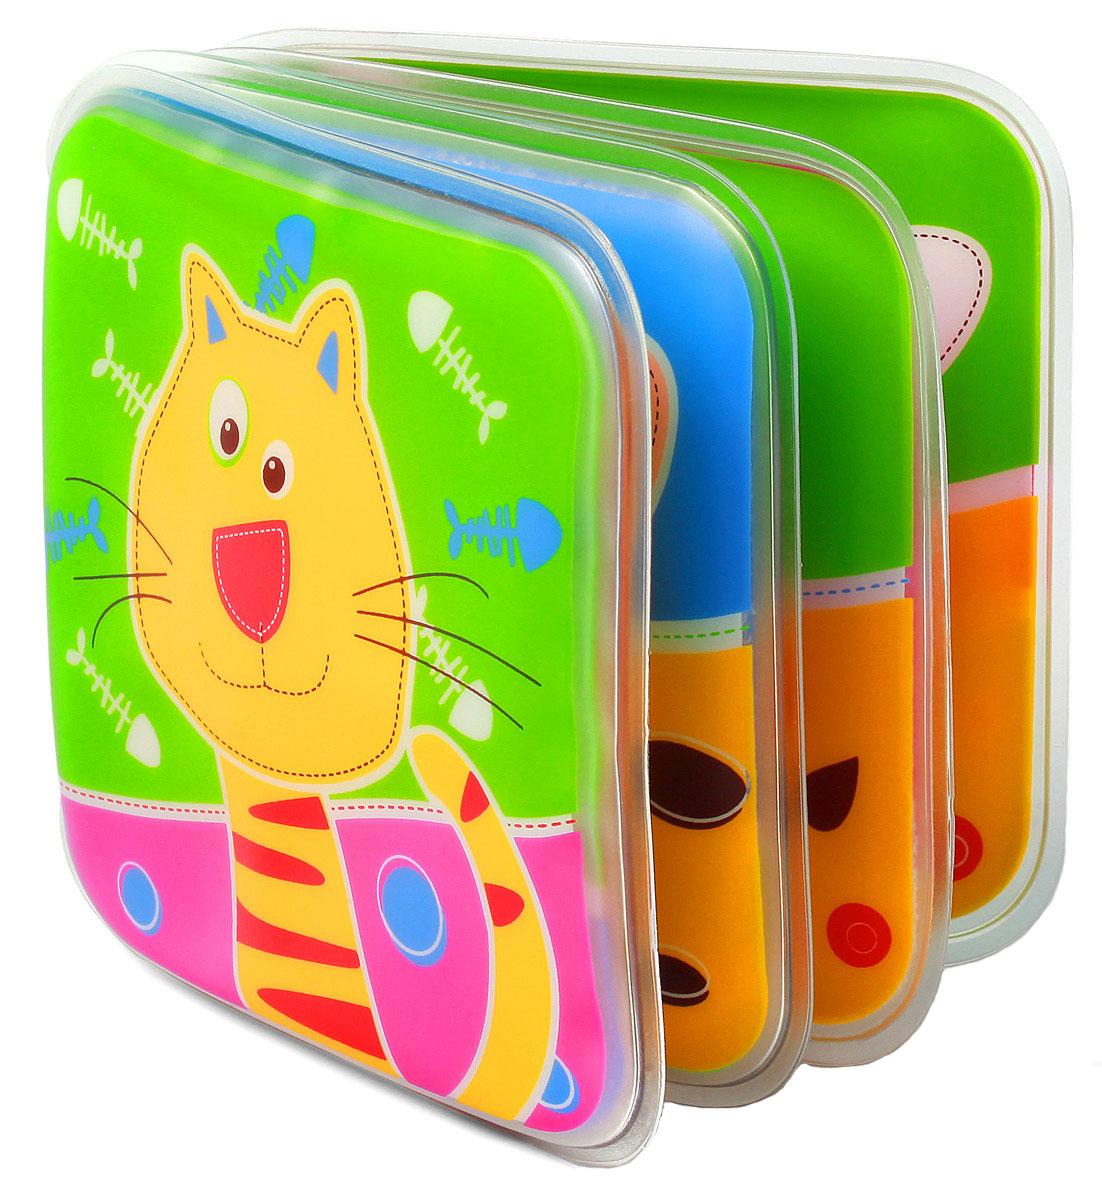 BabyOno Книжка-игрушка babyono игрушка пищалка babyono овечка с прорезывателем